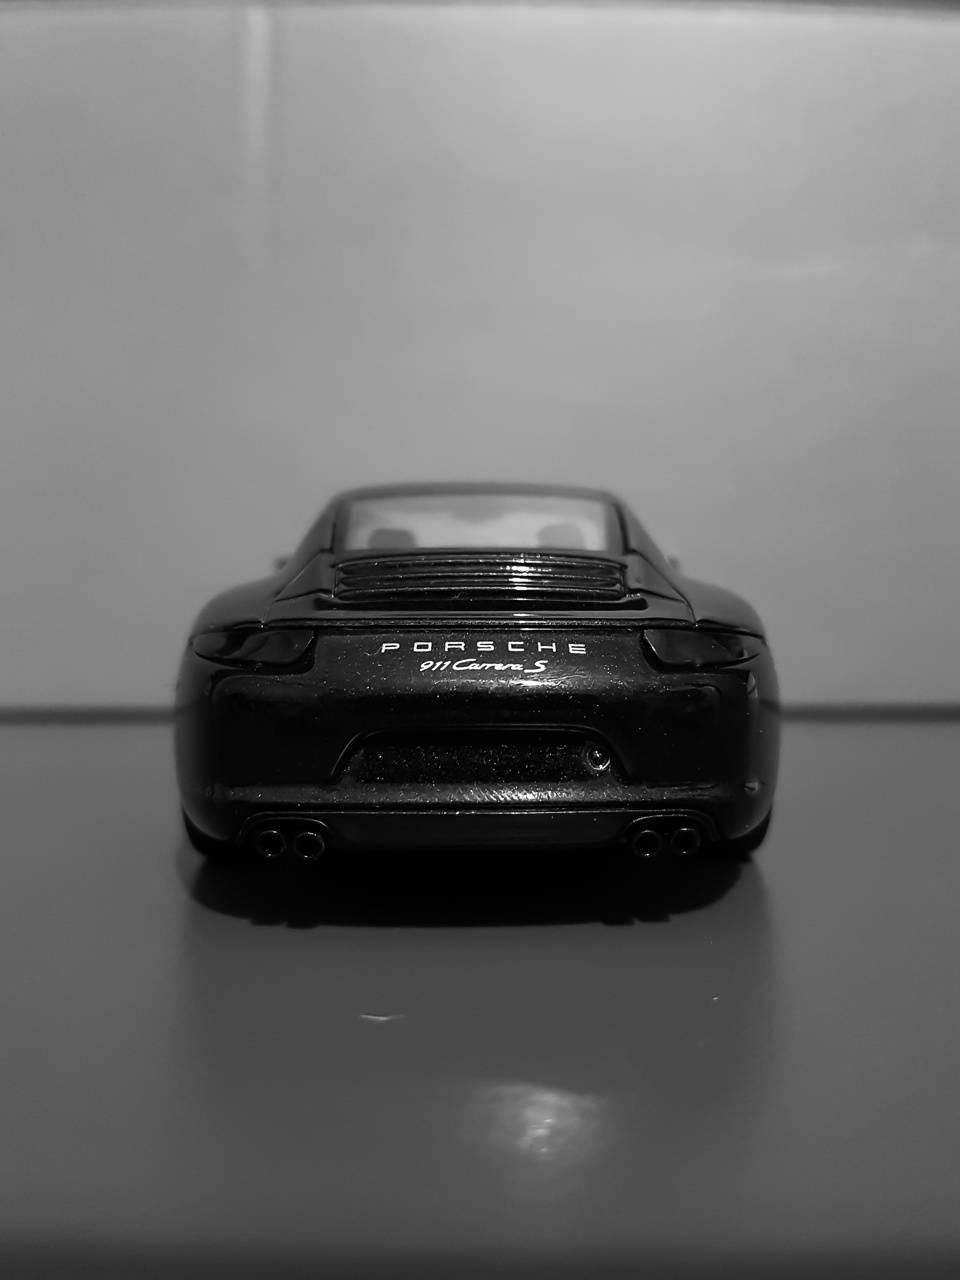 Porsche 911 Carreras Wallpaper By Ahmozn A3 Free On Zedge